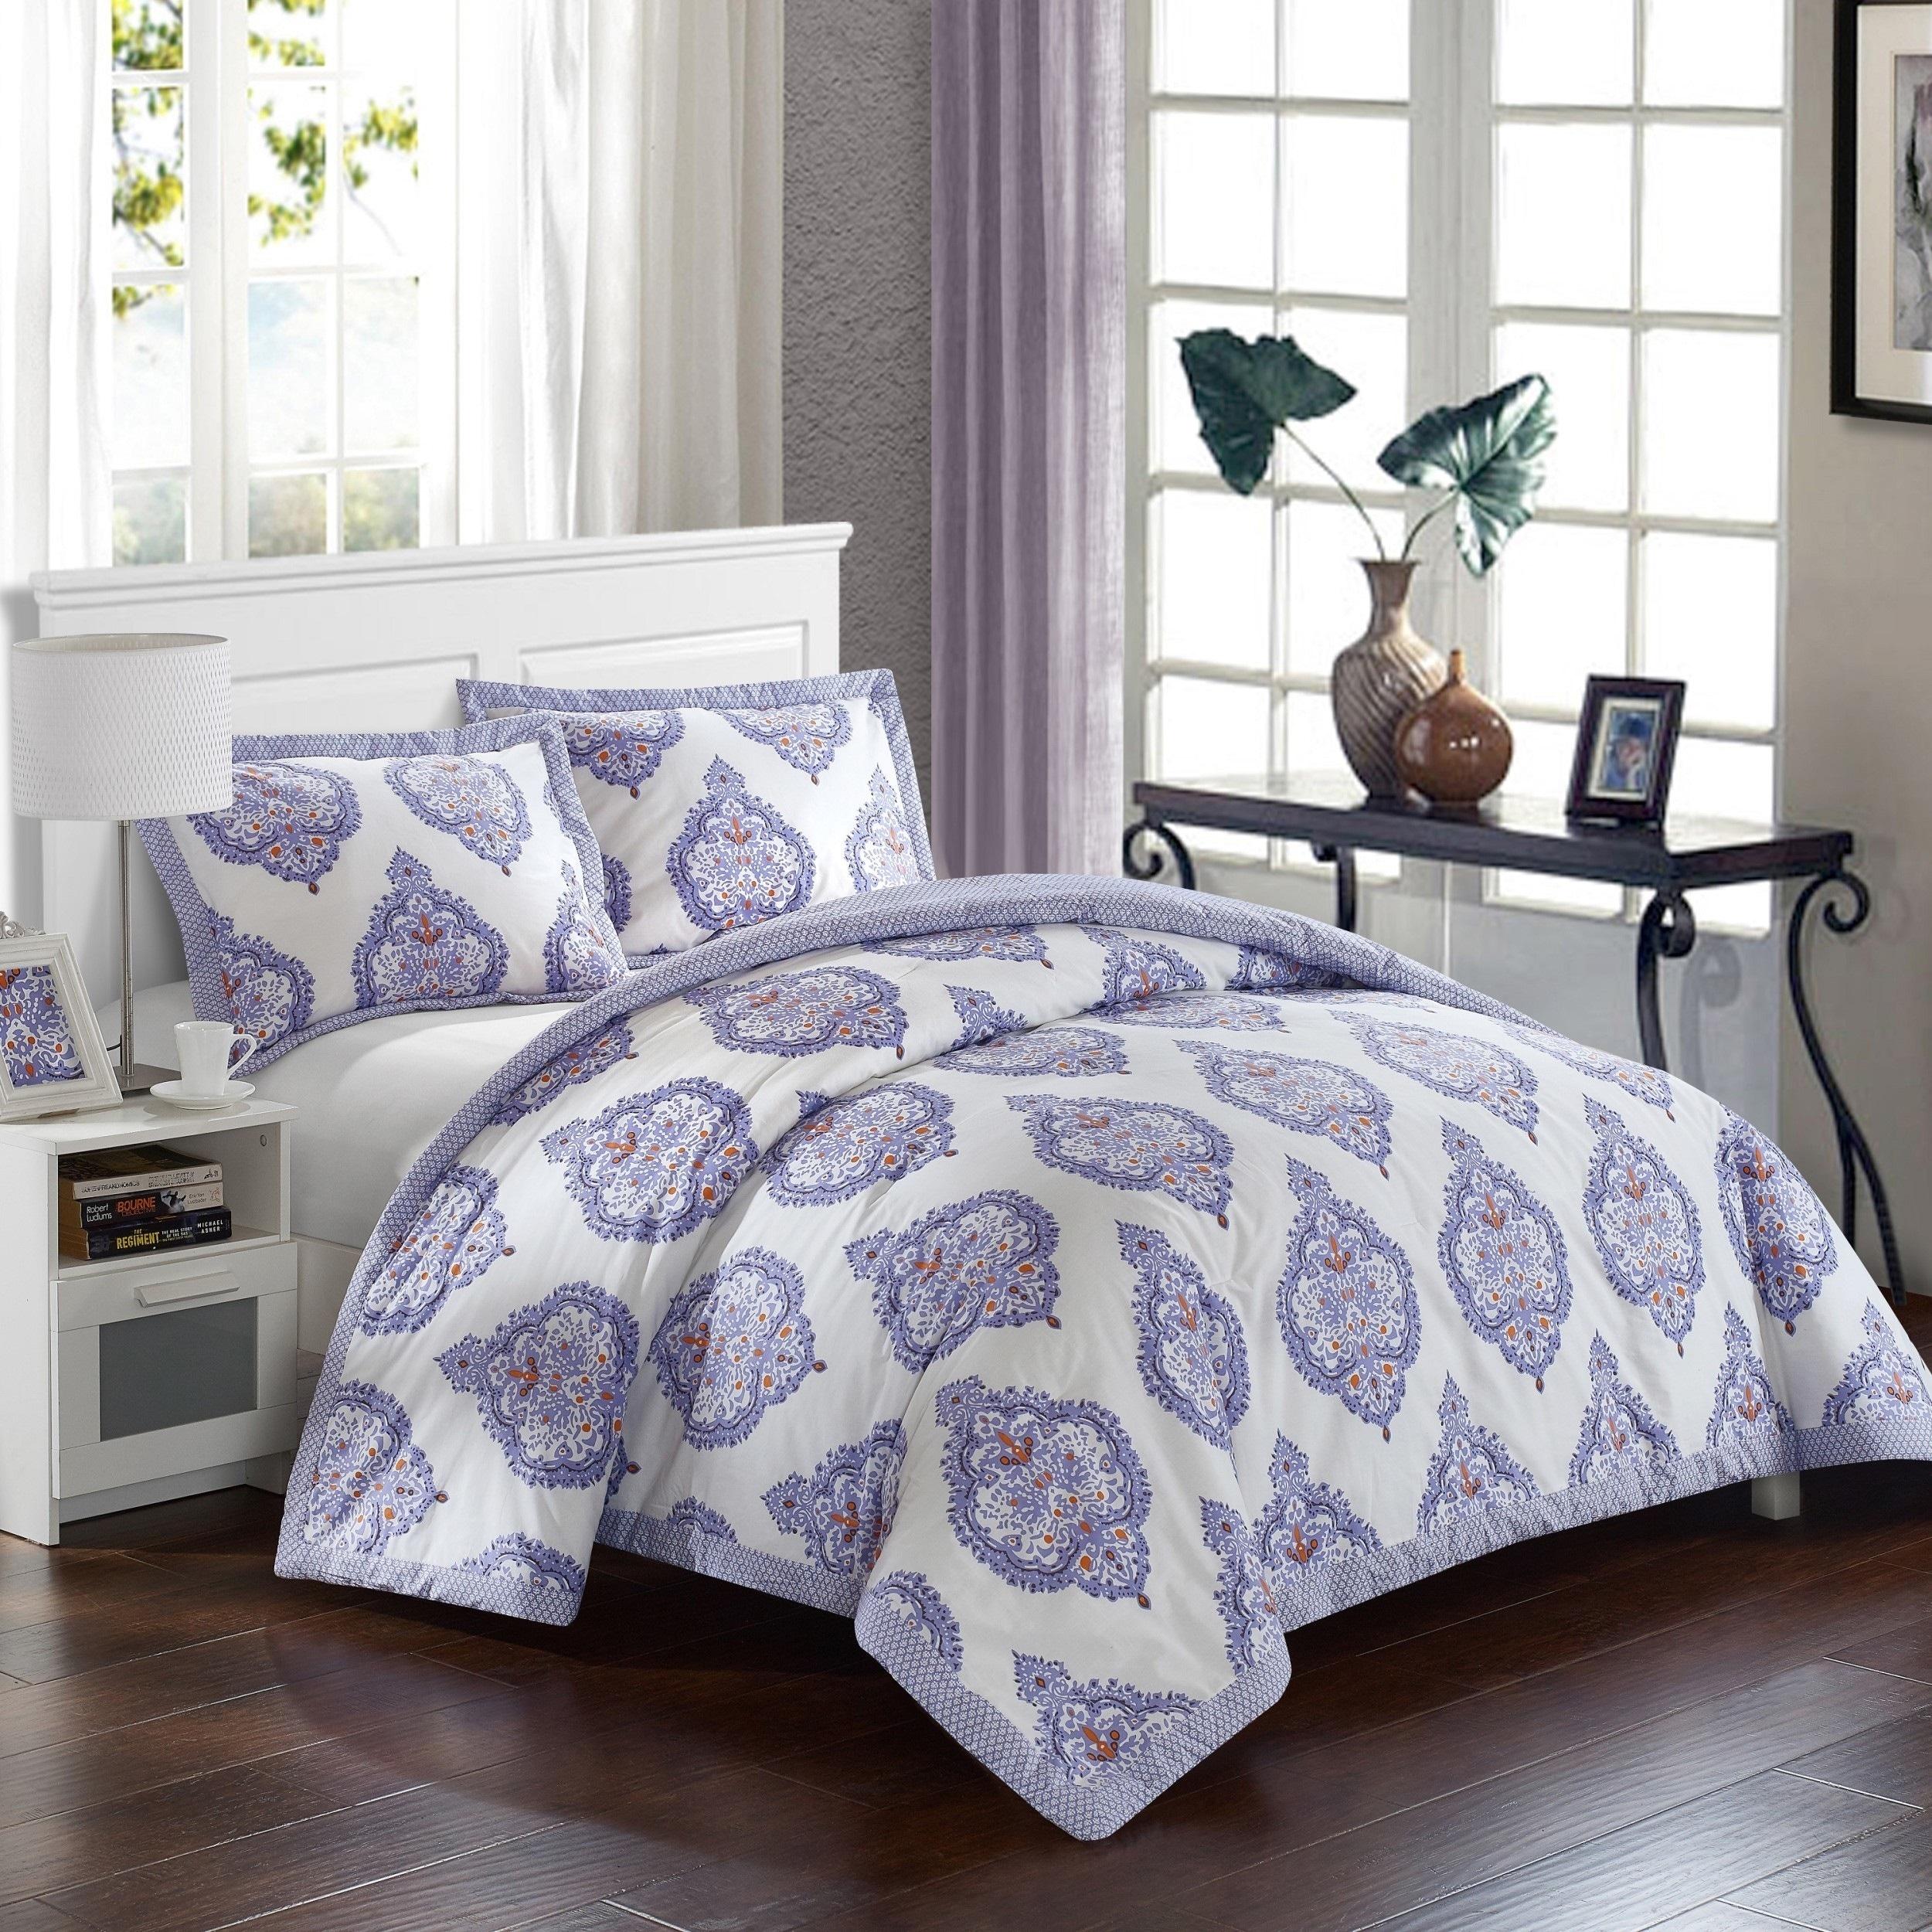 Lux Bed Cotton 3 Piece Bergen Palace Lavender Comforter Set Overstock 14140188